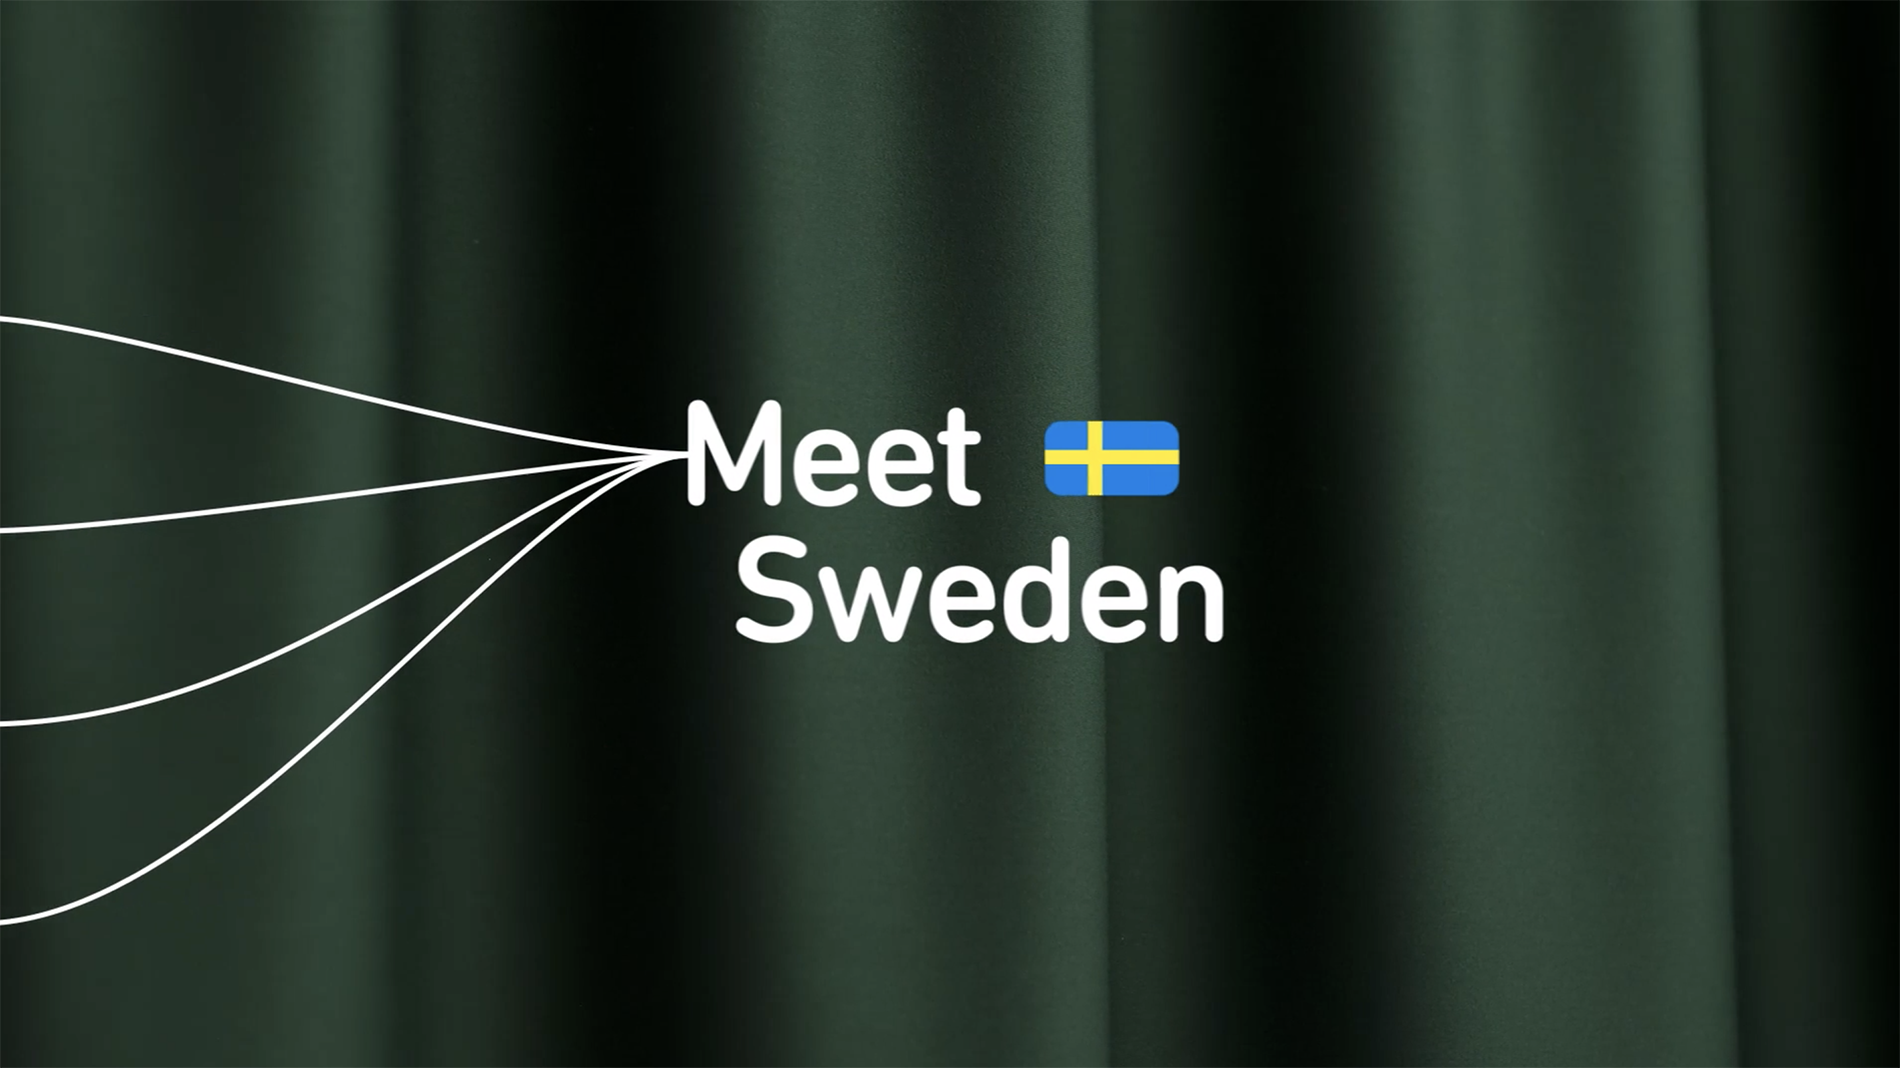 Meet Sweden